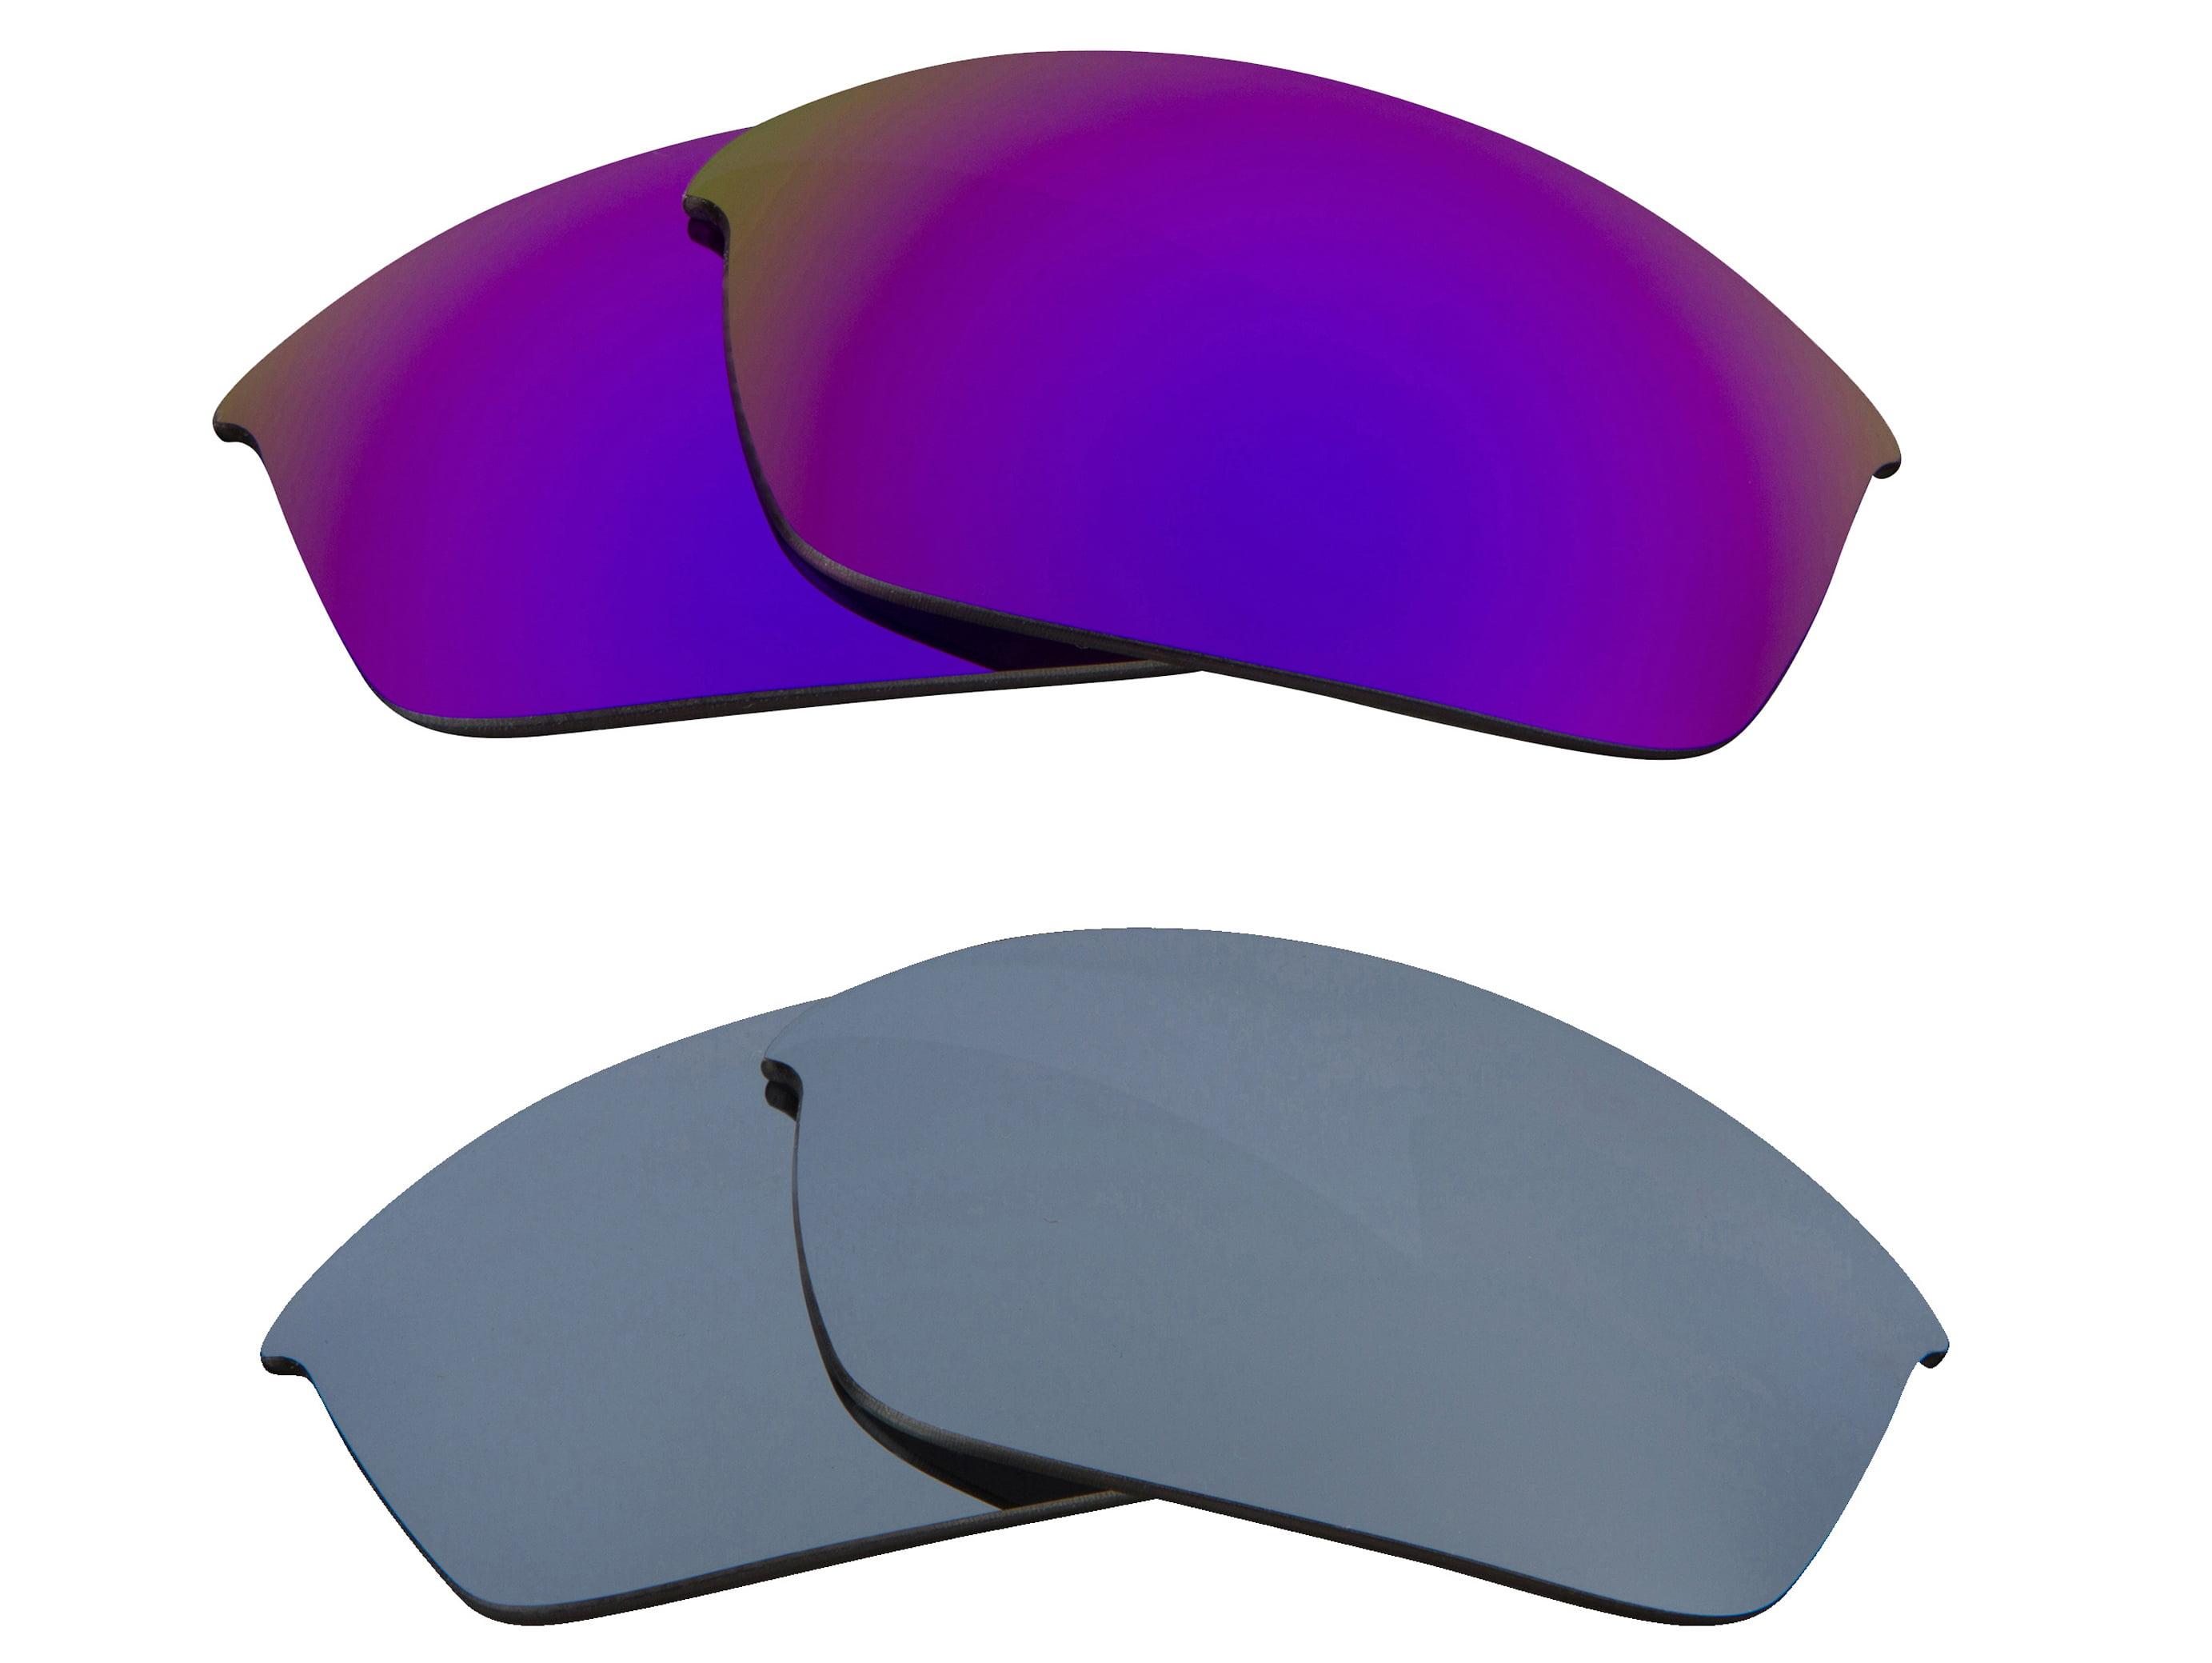 da55bf13f8 FLAK JACKET Replacement Lenses Polarized Silver   Purple by SEEK fits OAKLEY